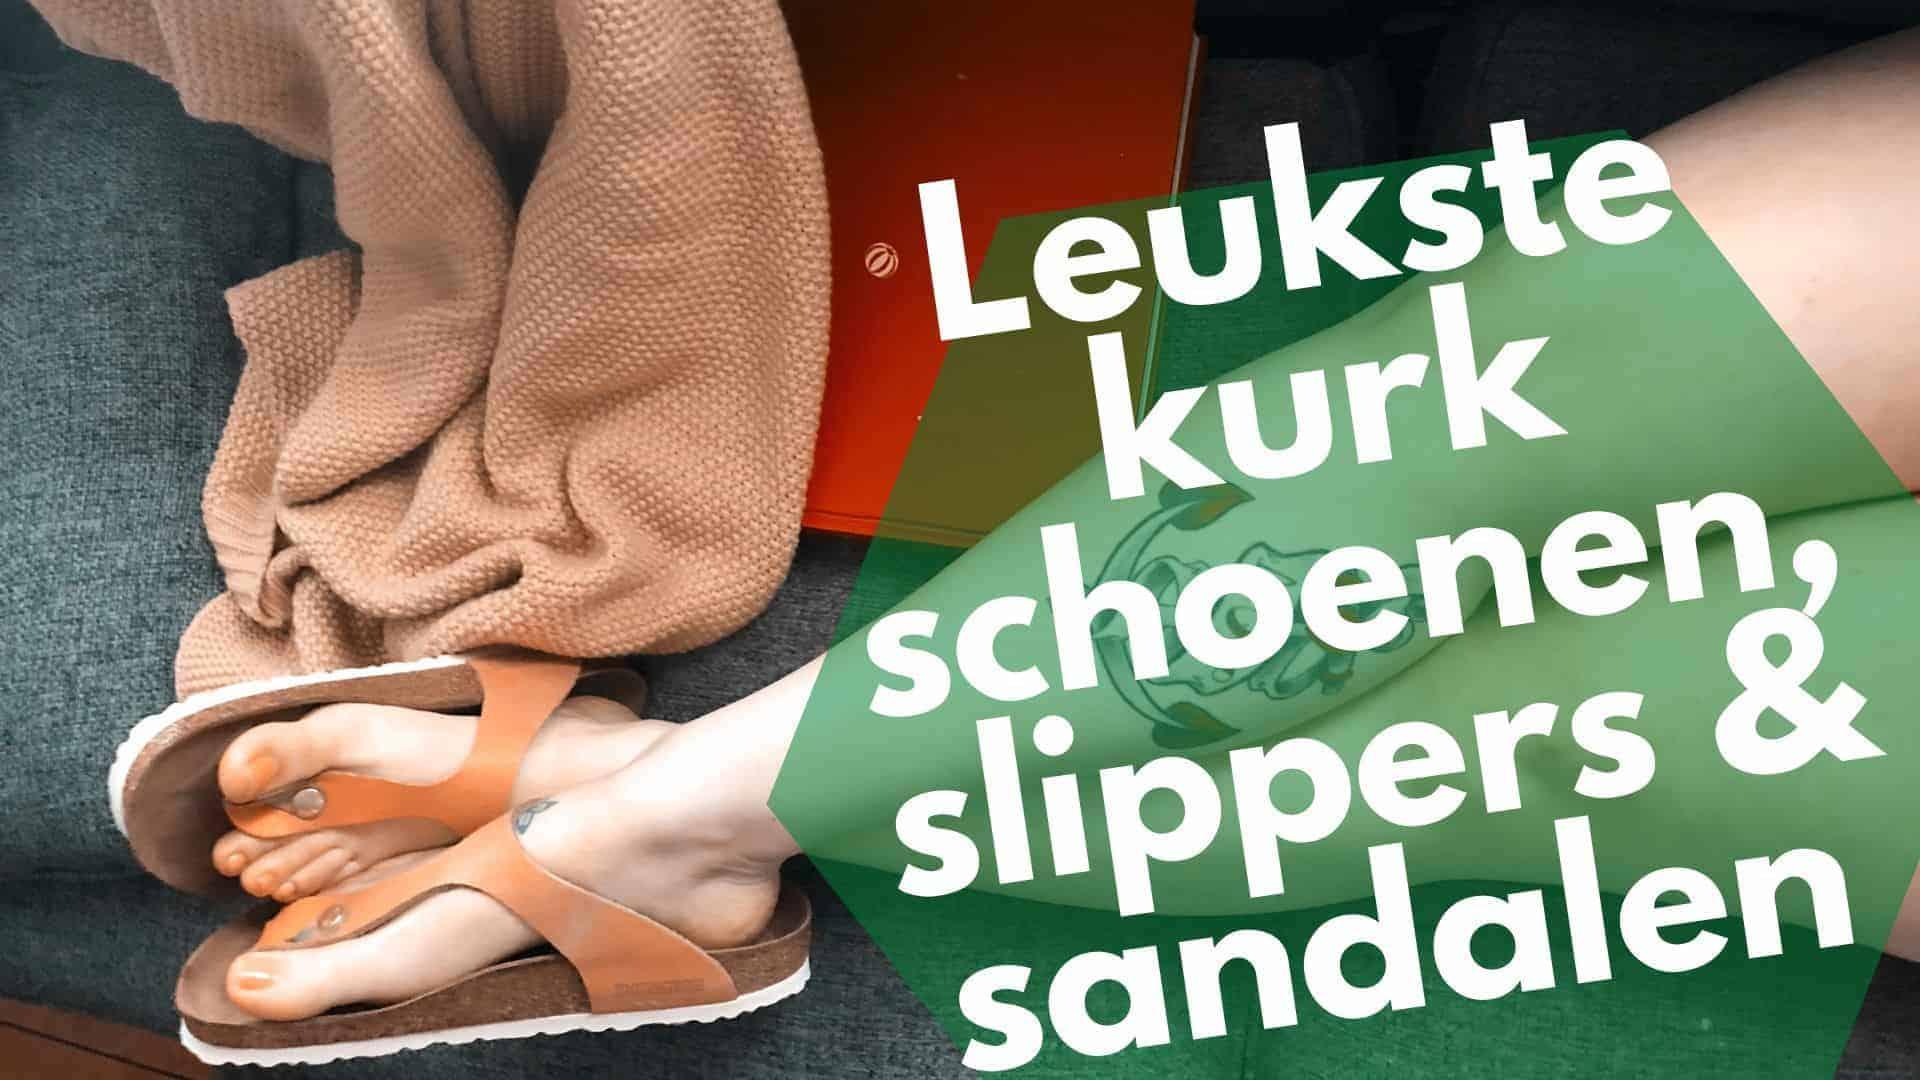 Kurk schoenen, slippers en sandalen